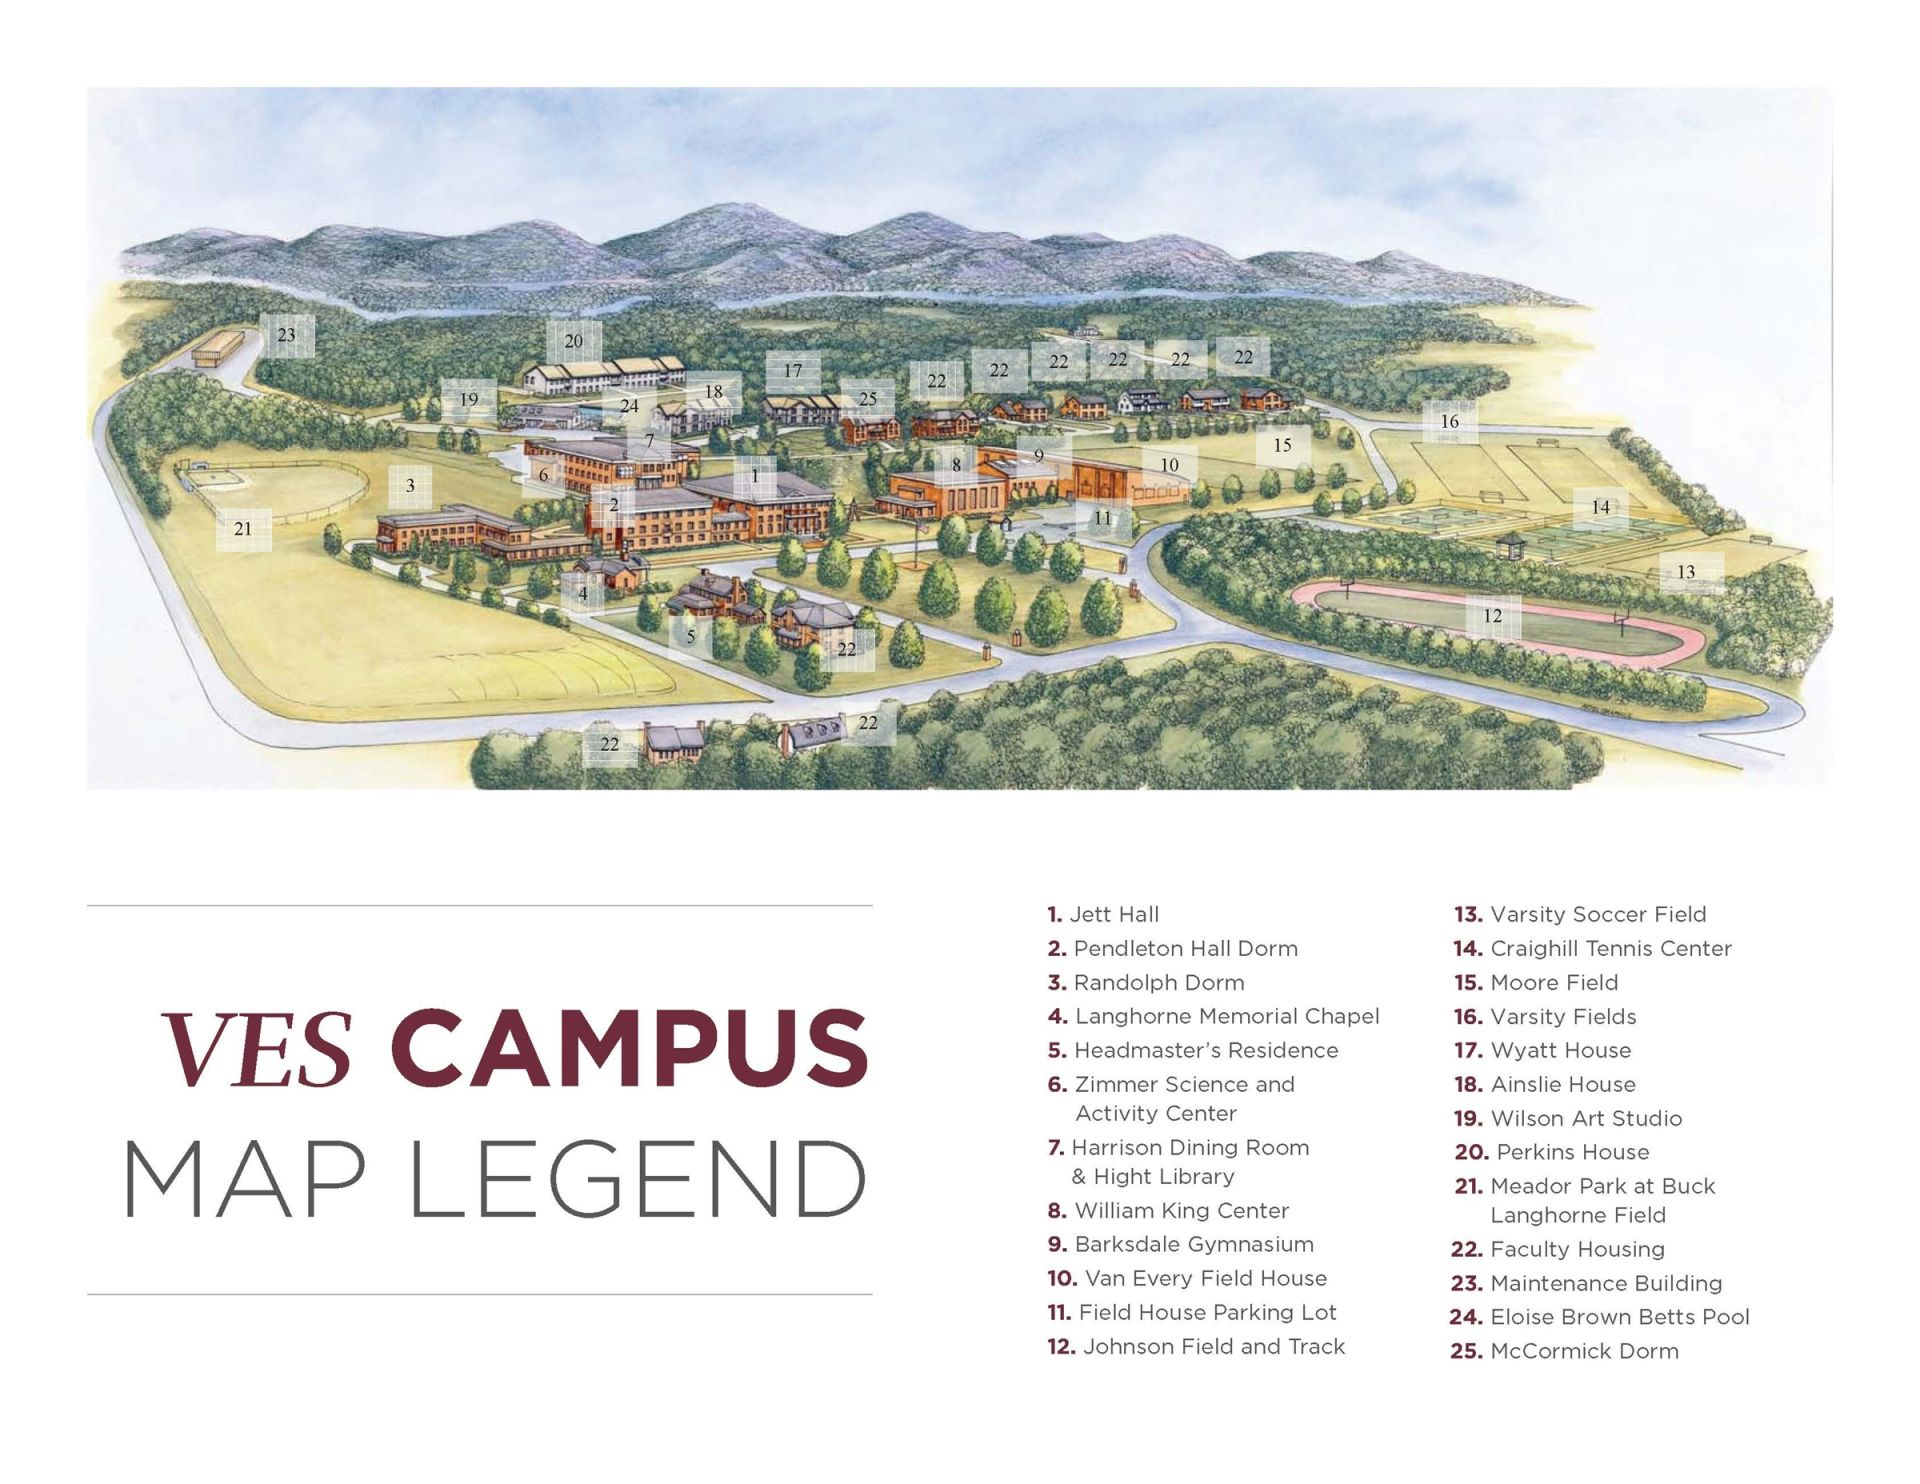 Take Our Campus Tour Virginia Episcopal School